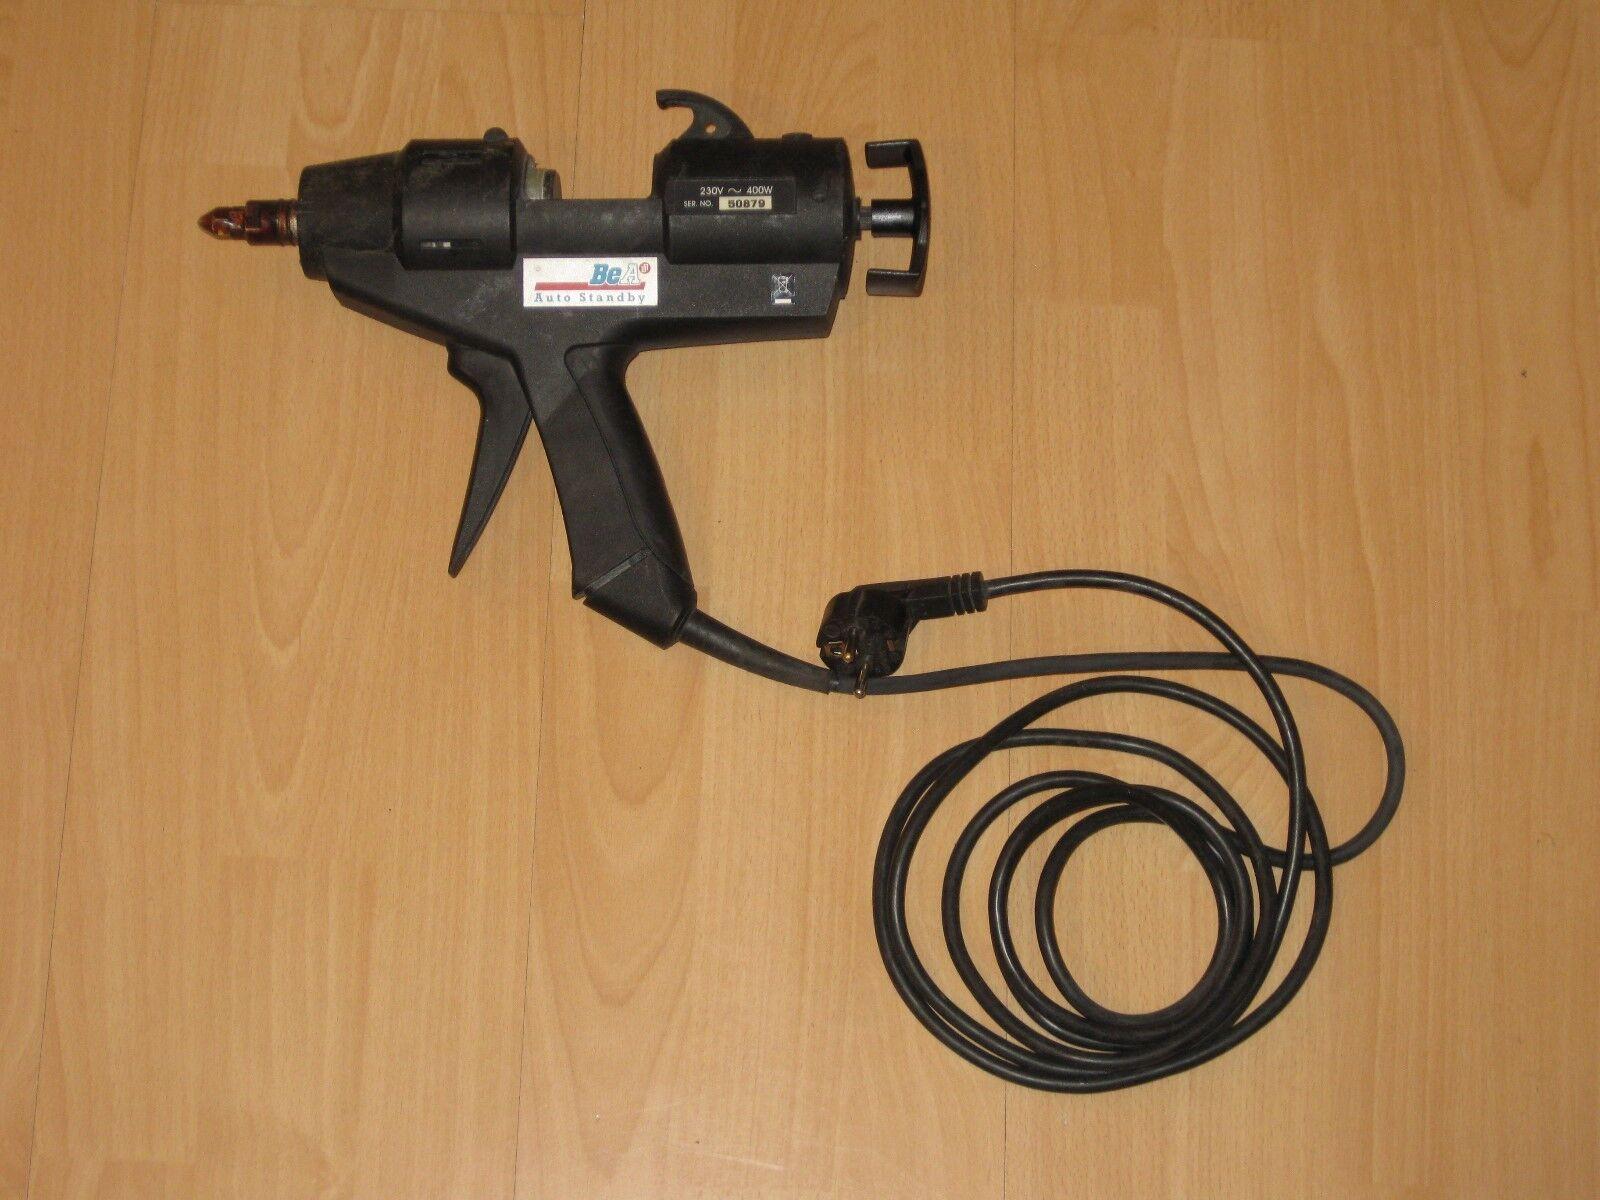 BEA 310 Plus Electronic Profi Schmelzklebepistole Heißklebepistole 400W NP 470 E